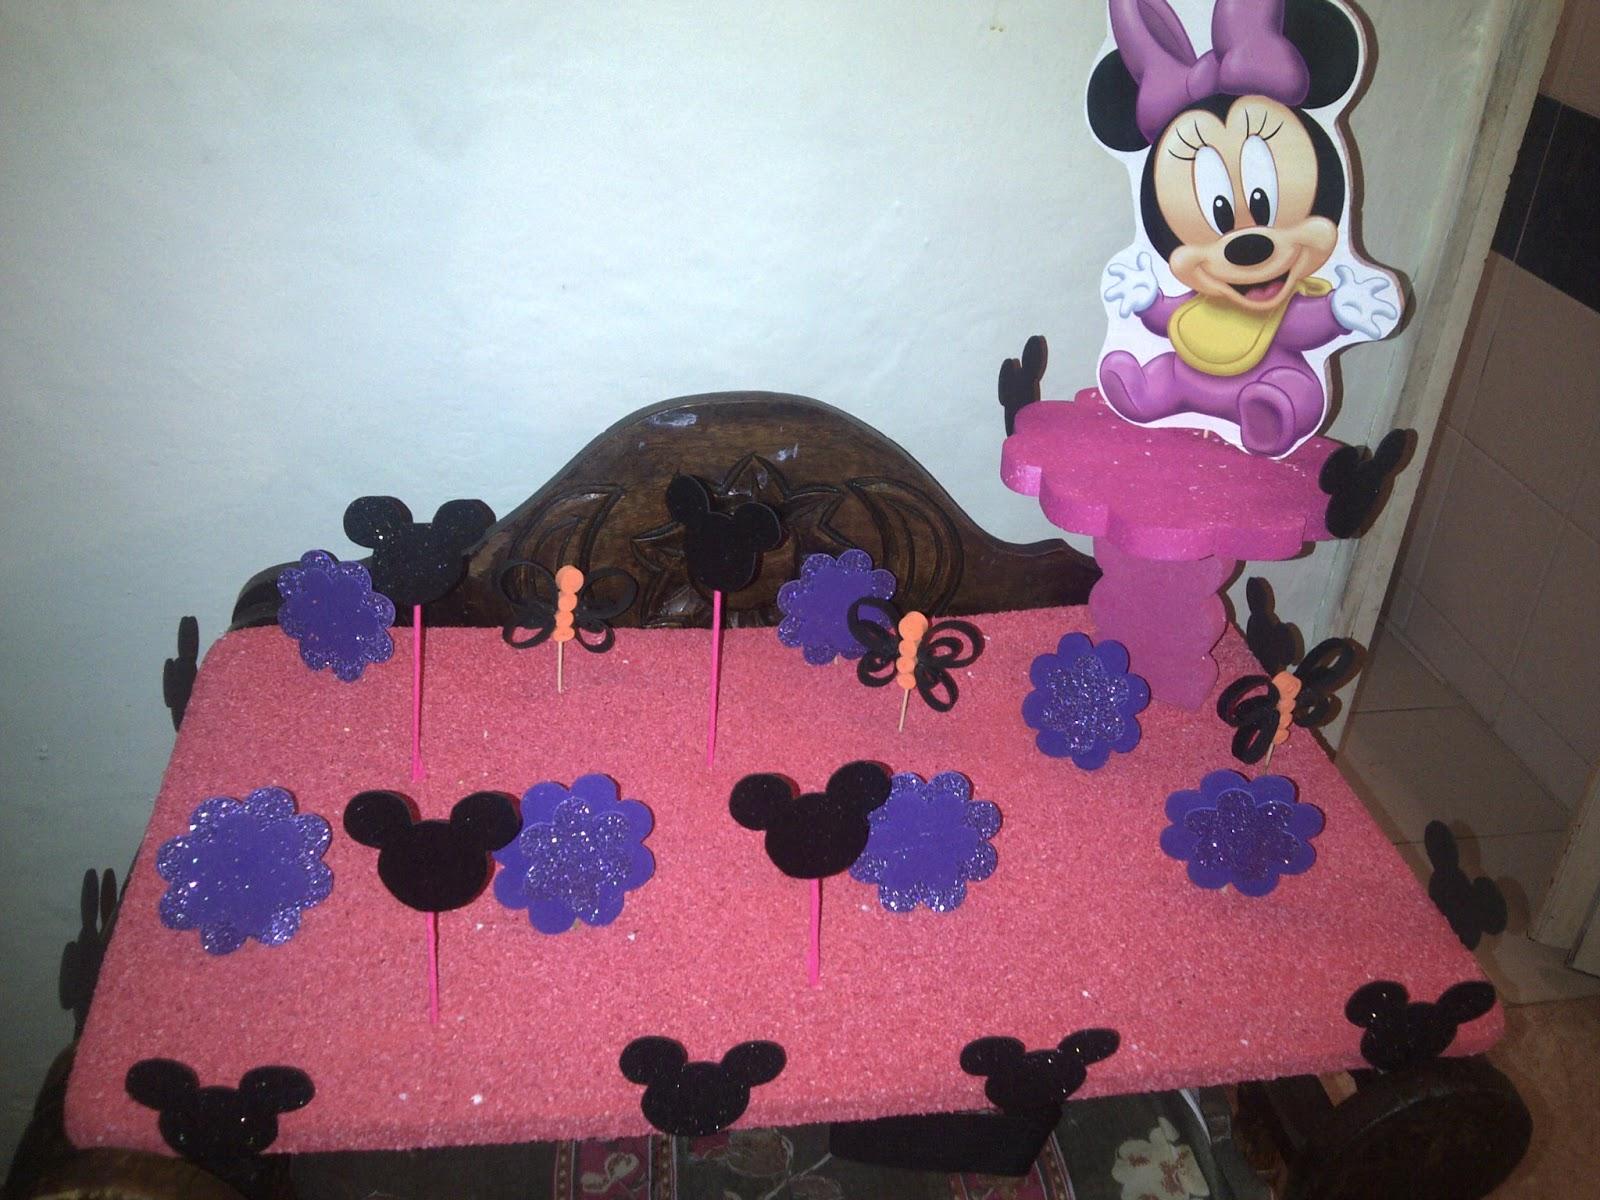 Chupetero de Minnie Mouse - Imagui